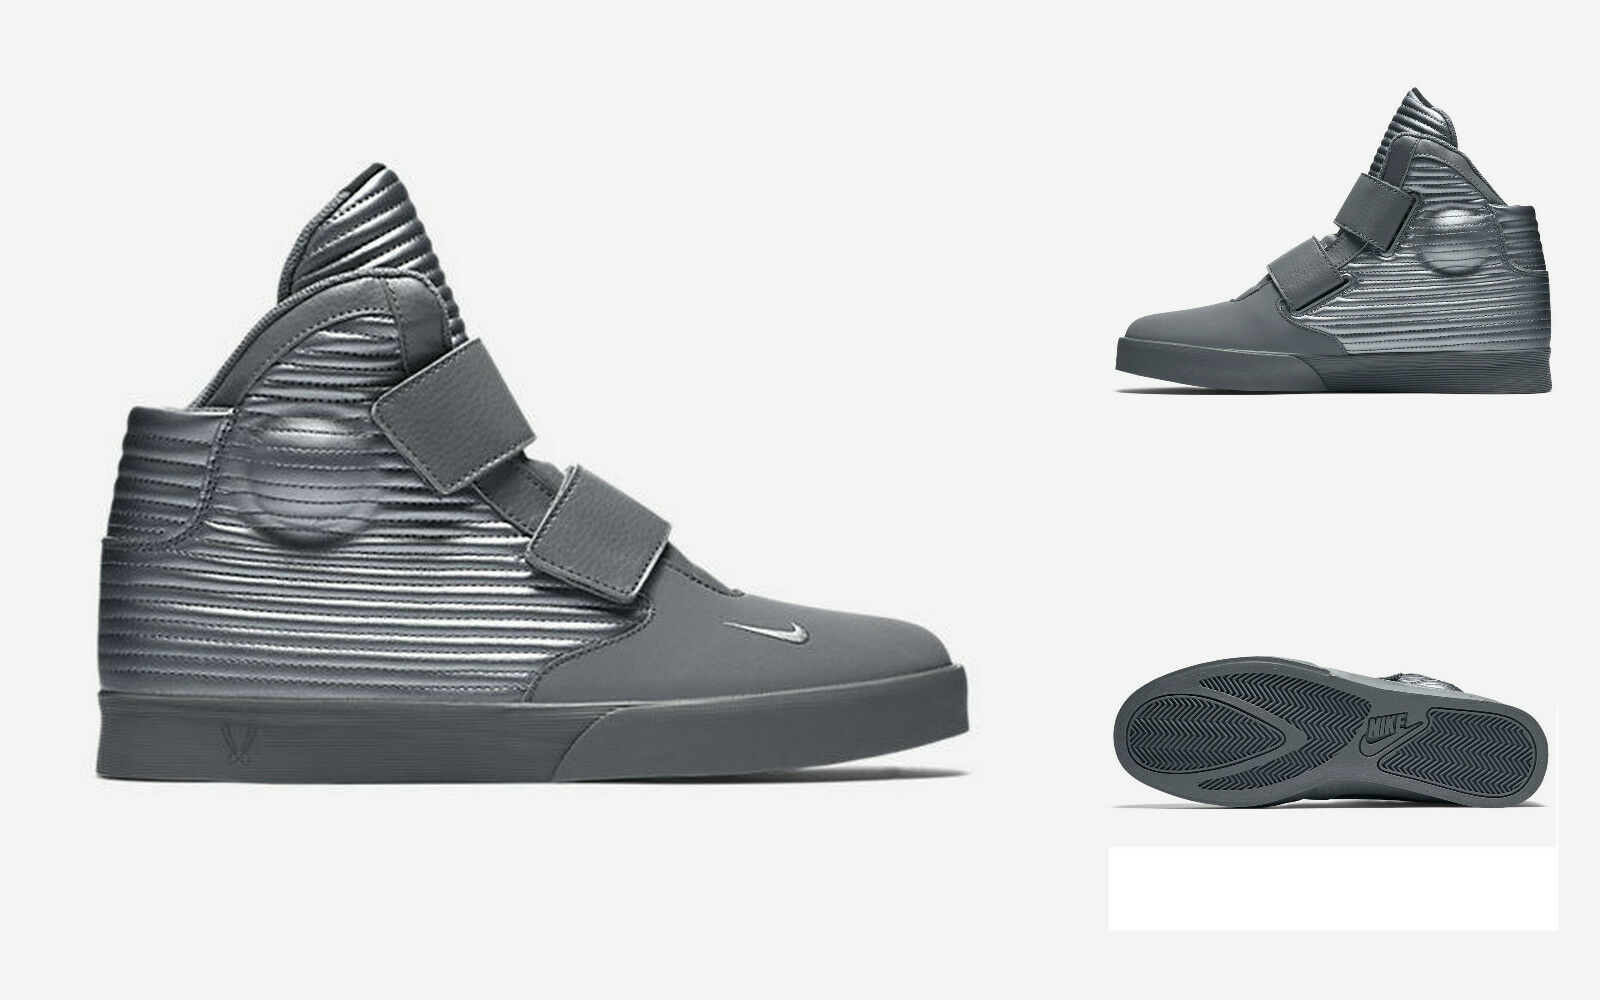 Nike flystepper 2k3 formatori scarpe grigio metallico 644576098 grigio